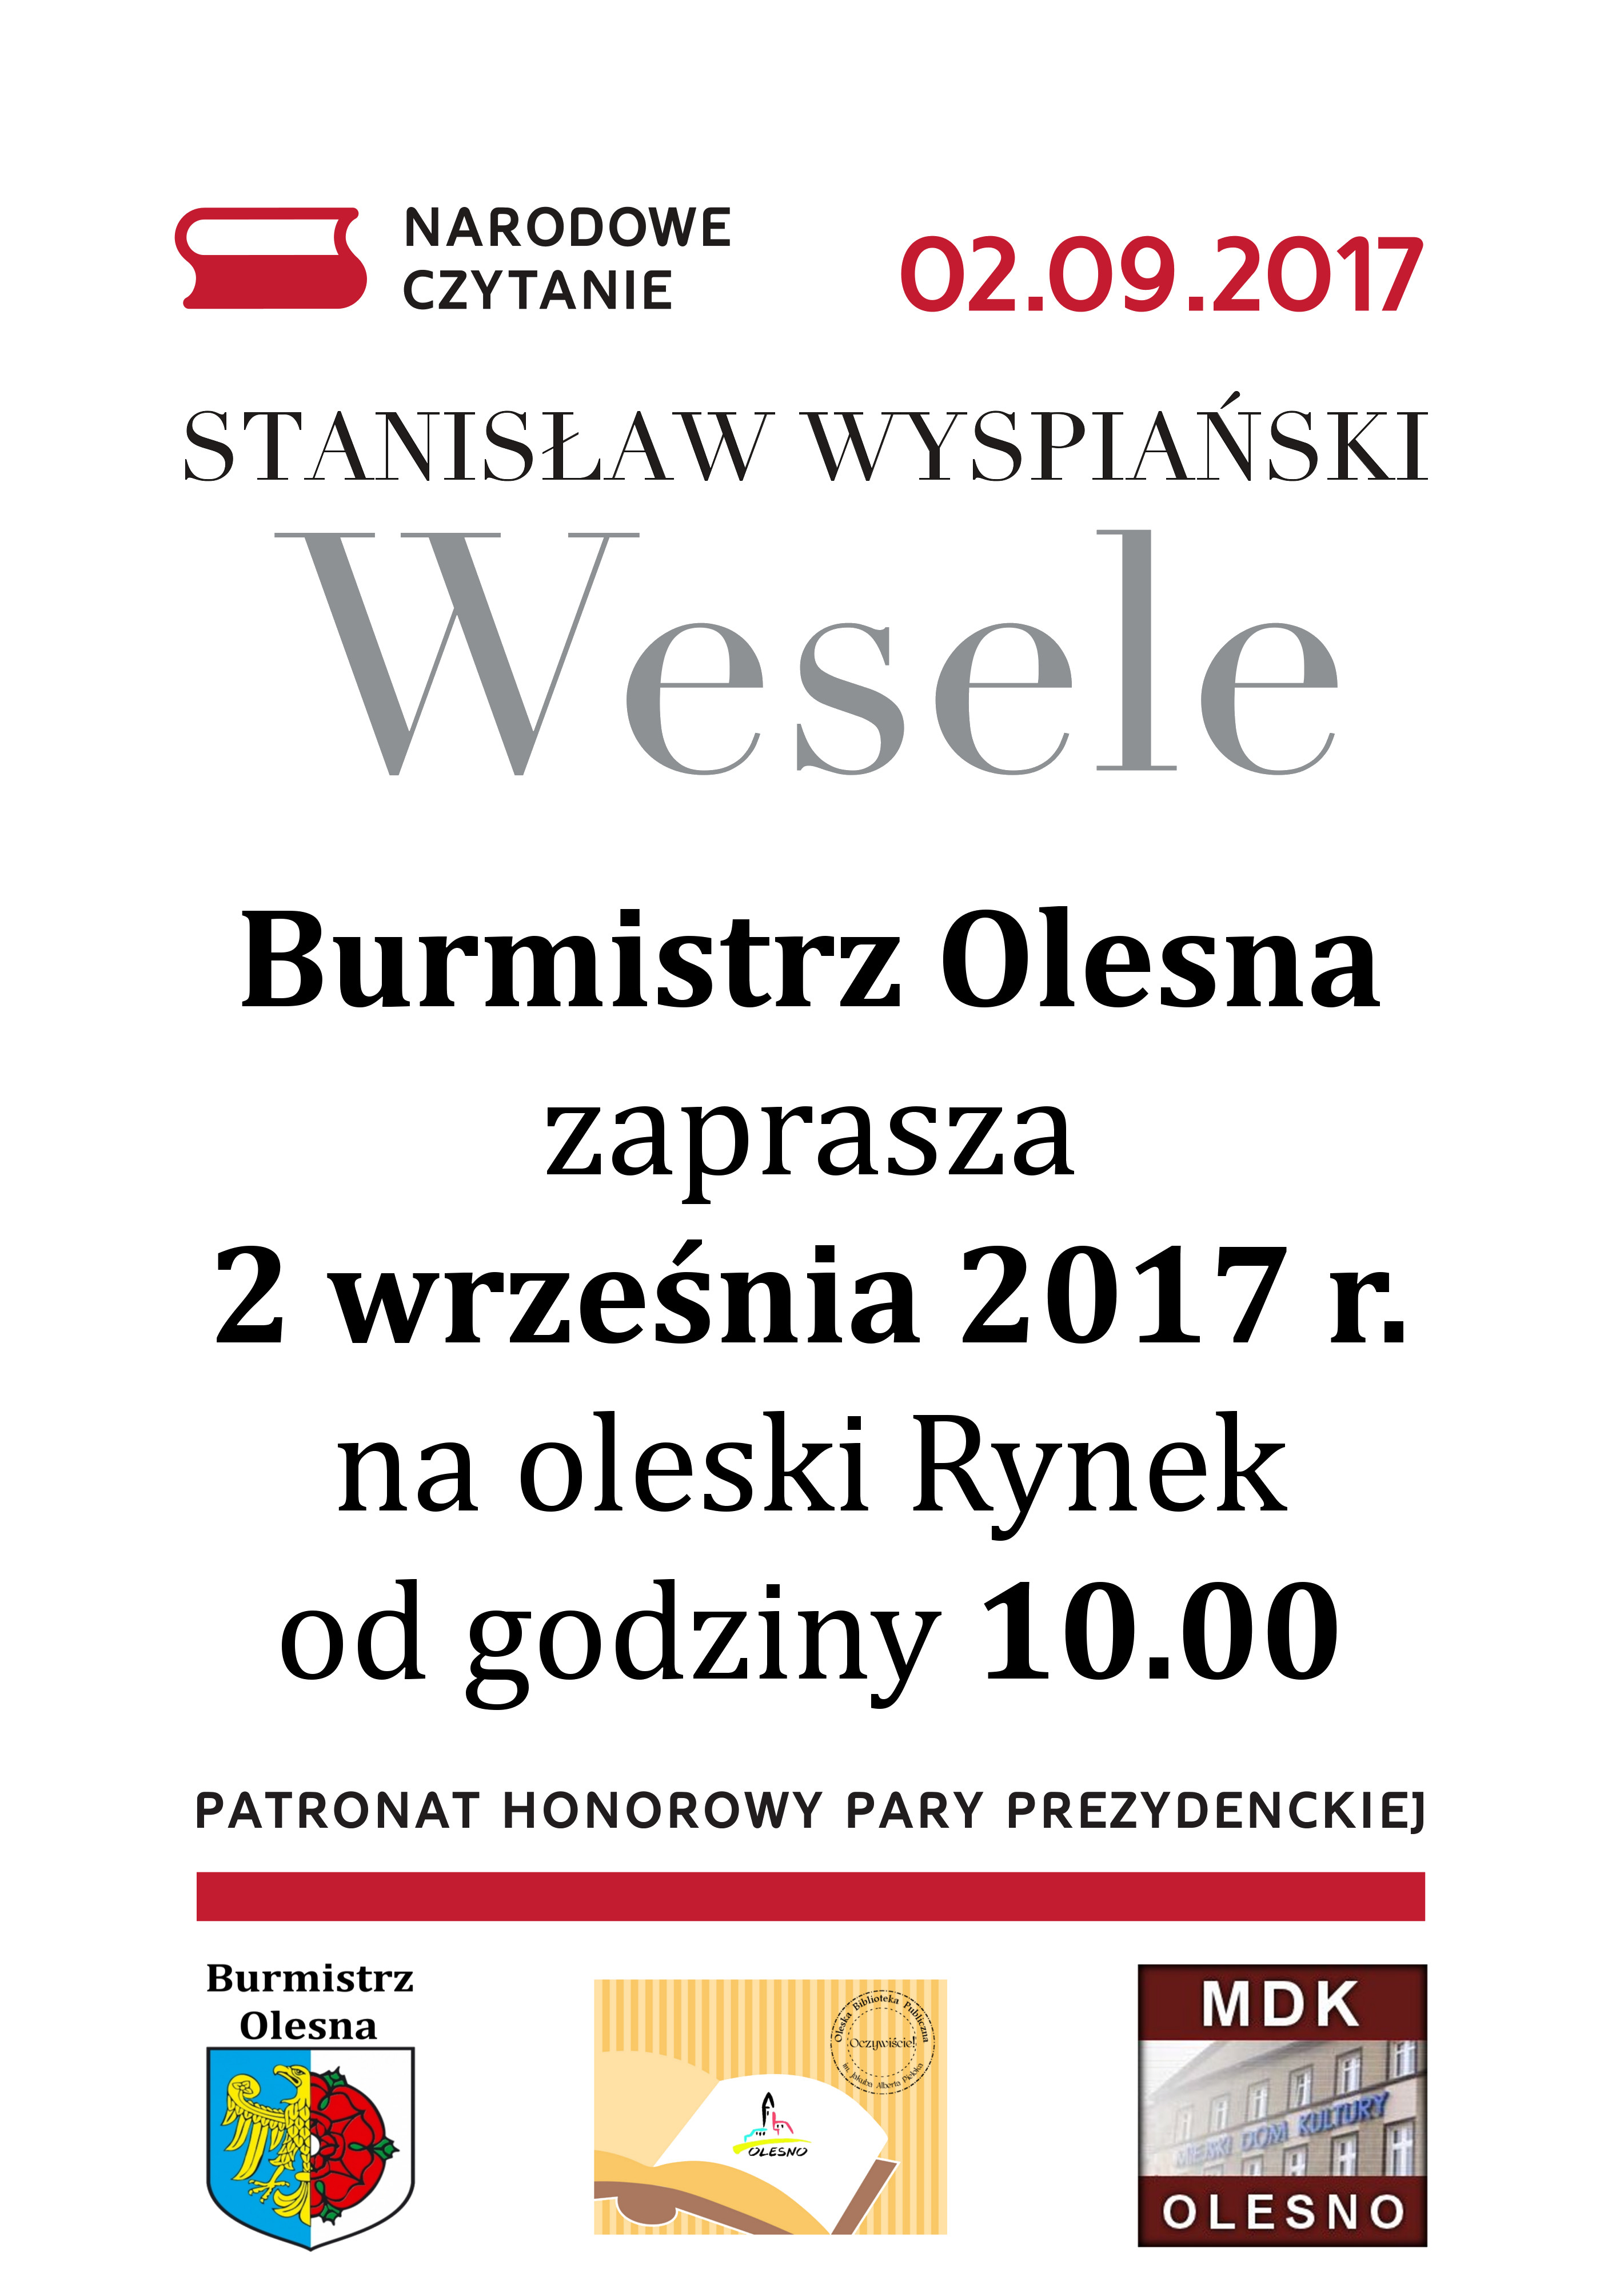 nc_plakat_wesele_z_3_loga_burmistrz_obp_mdk